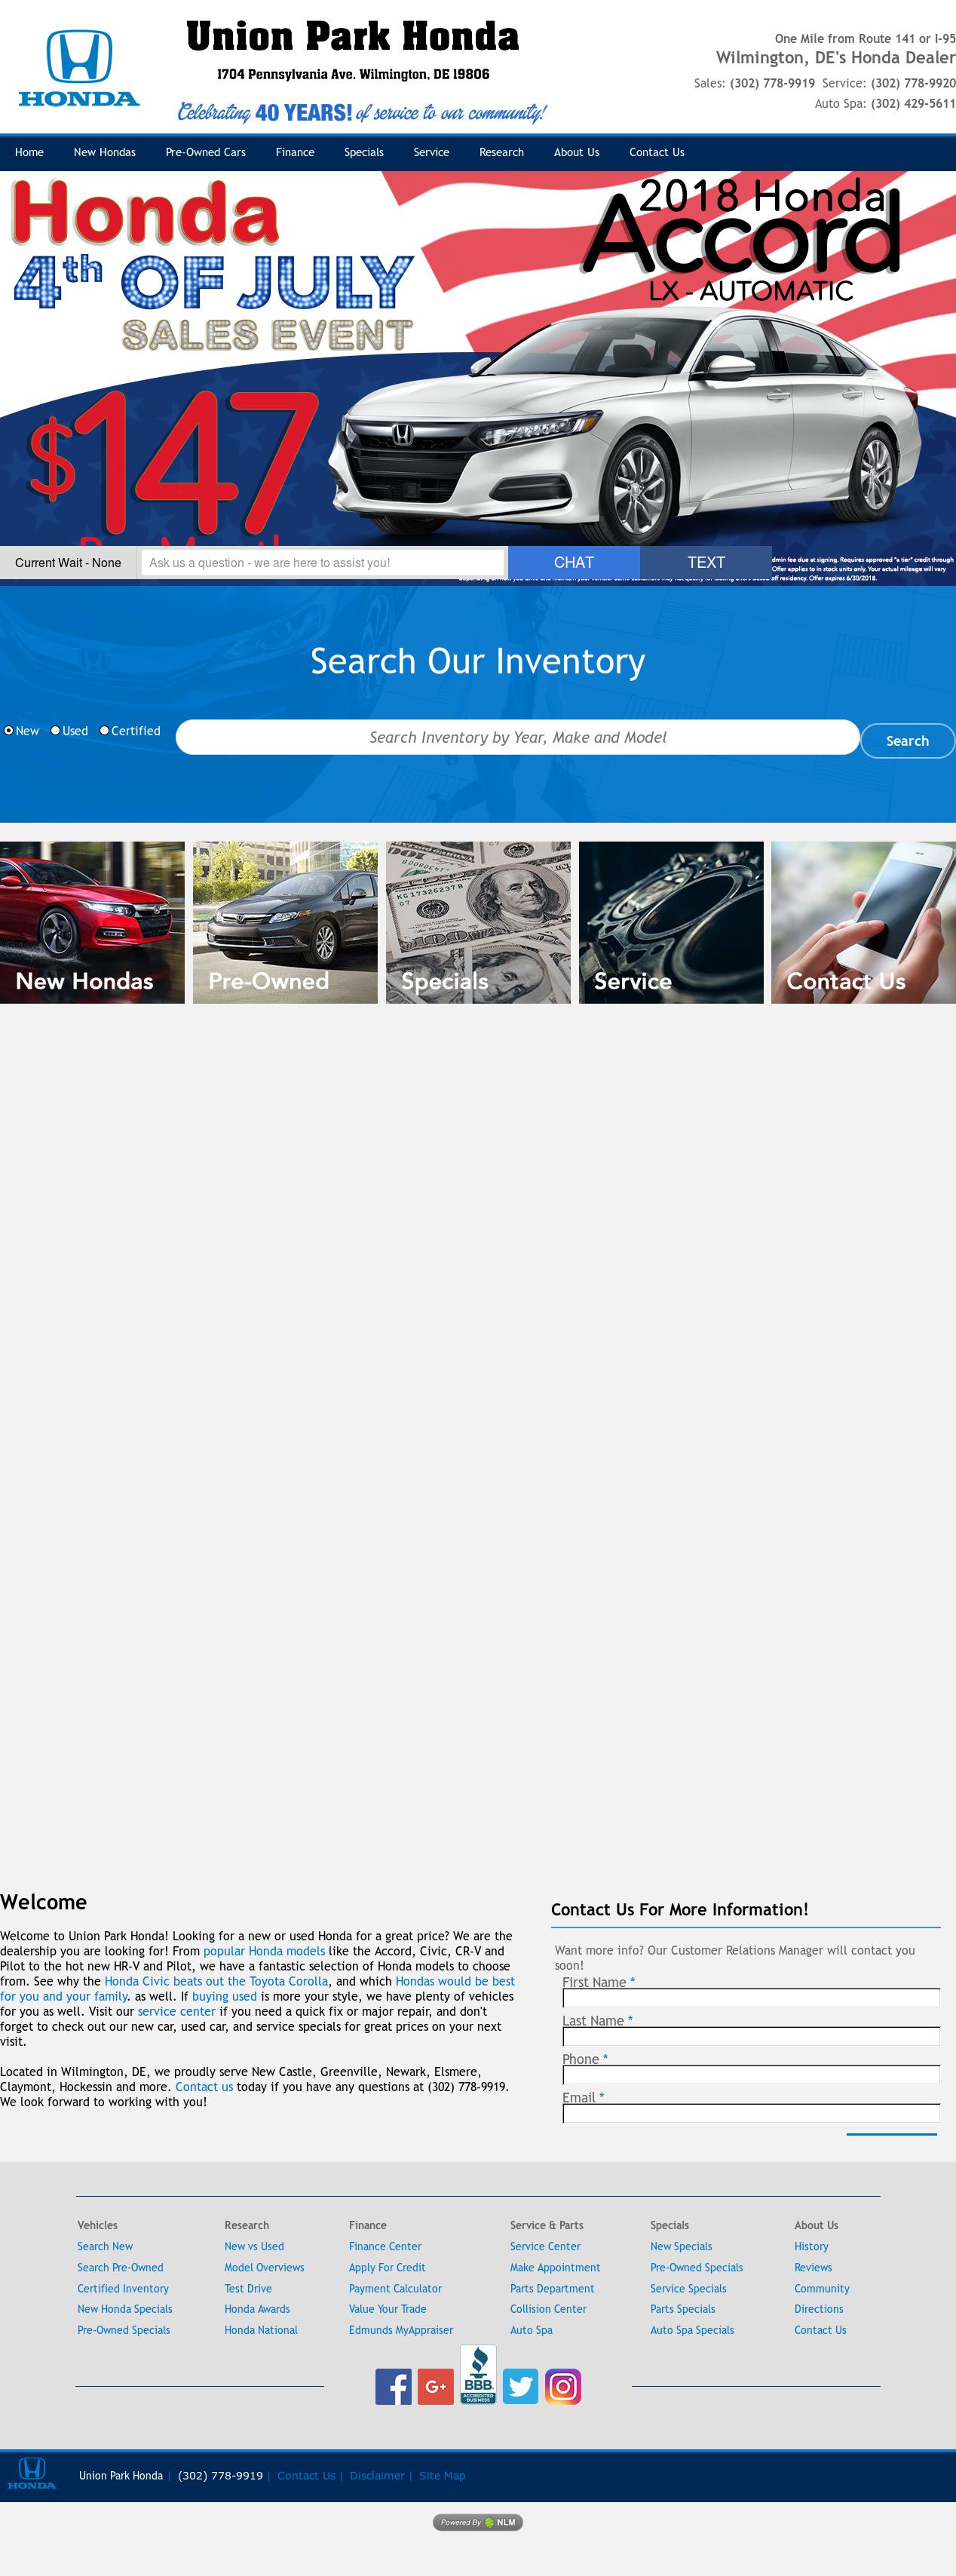 Union Park Honda Website History